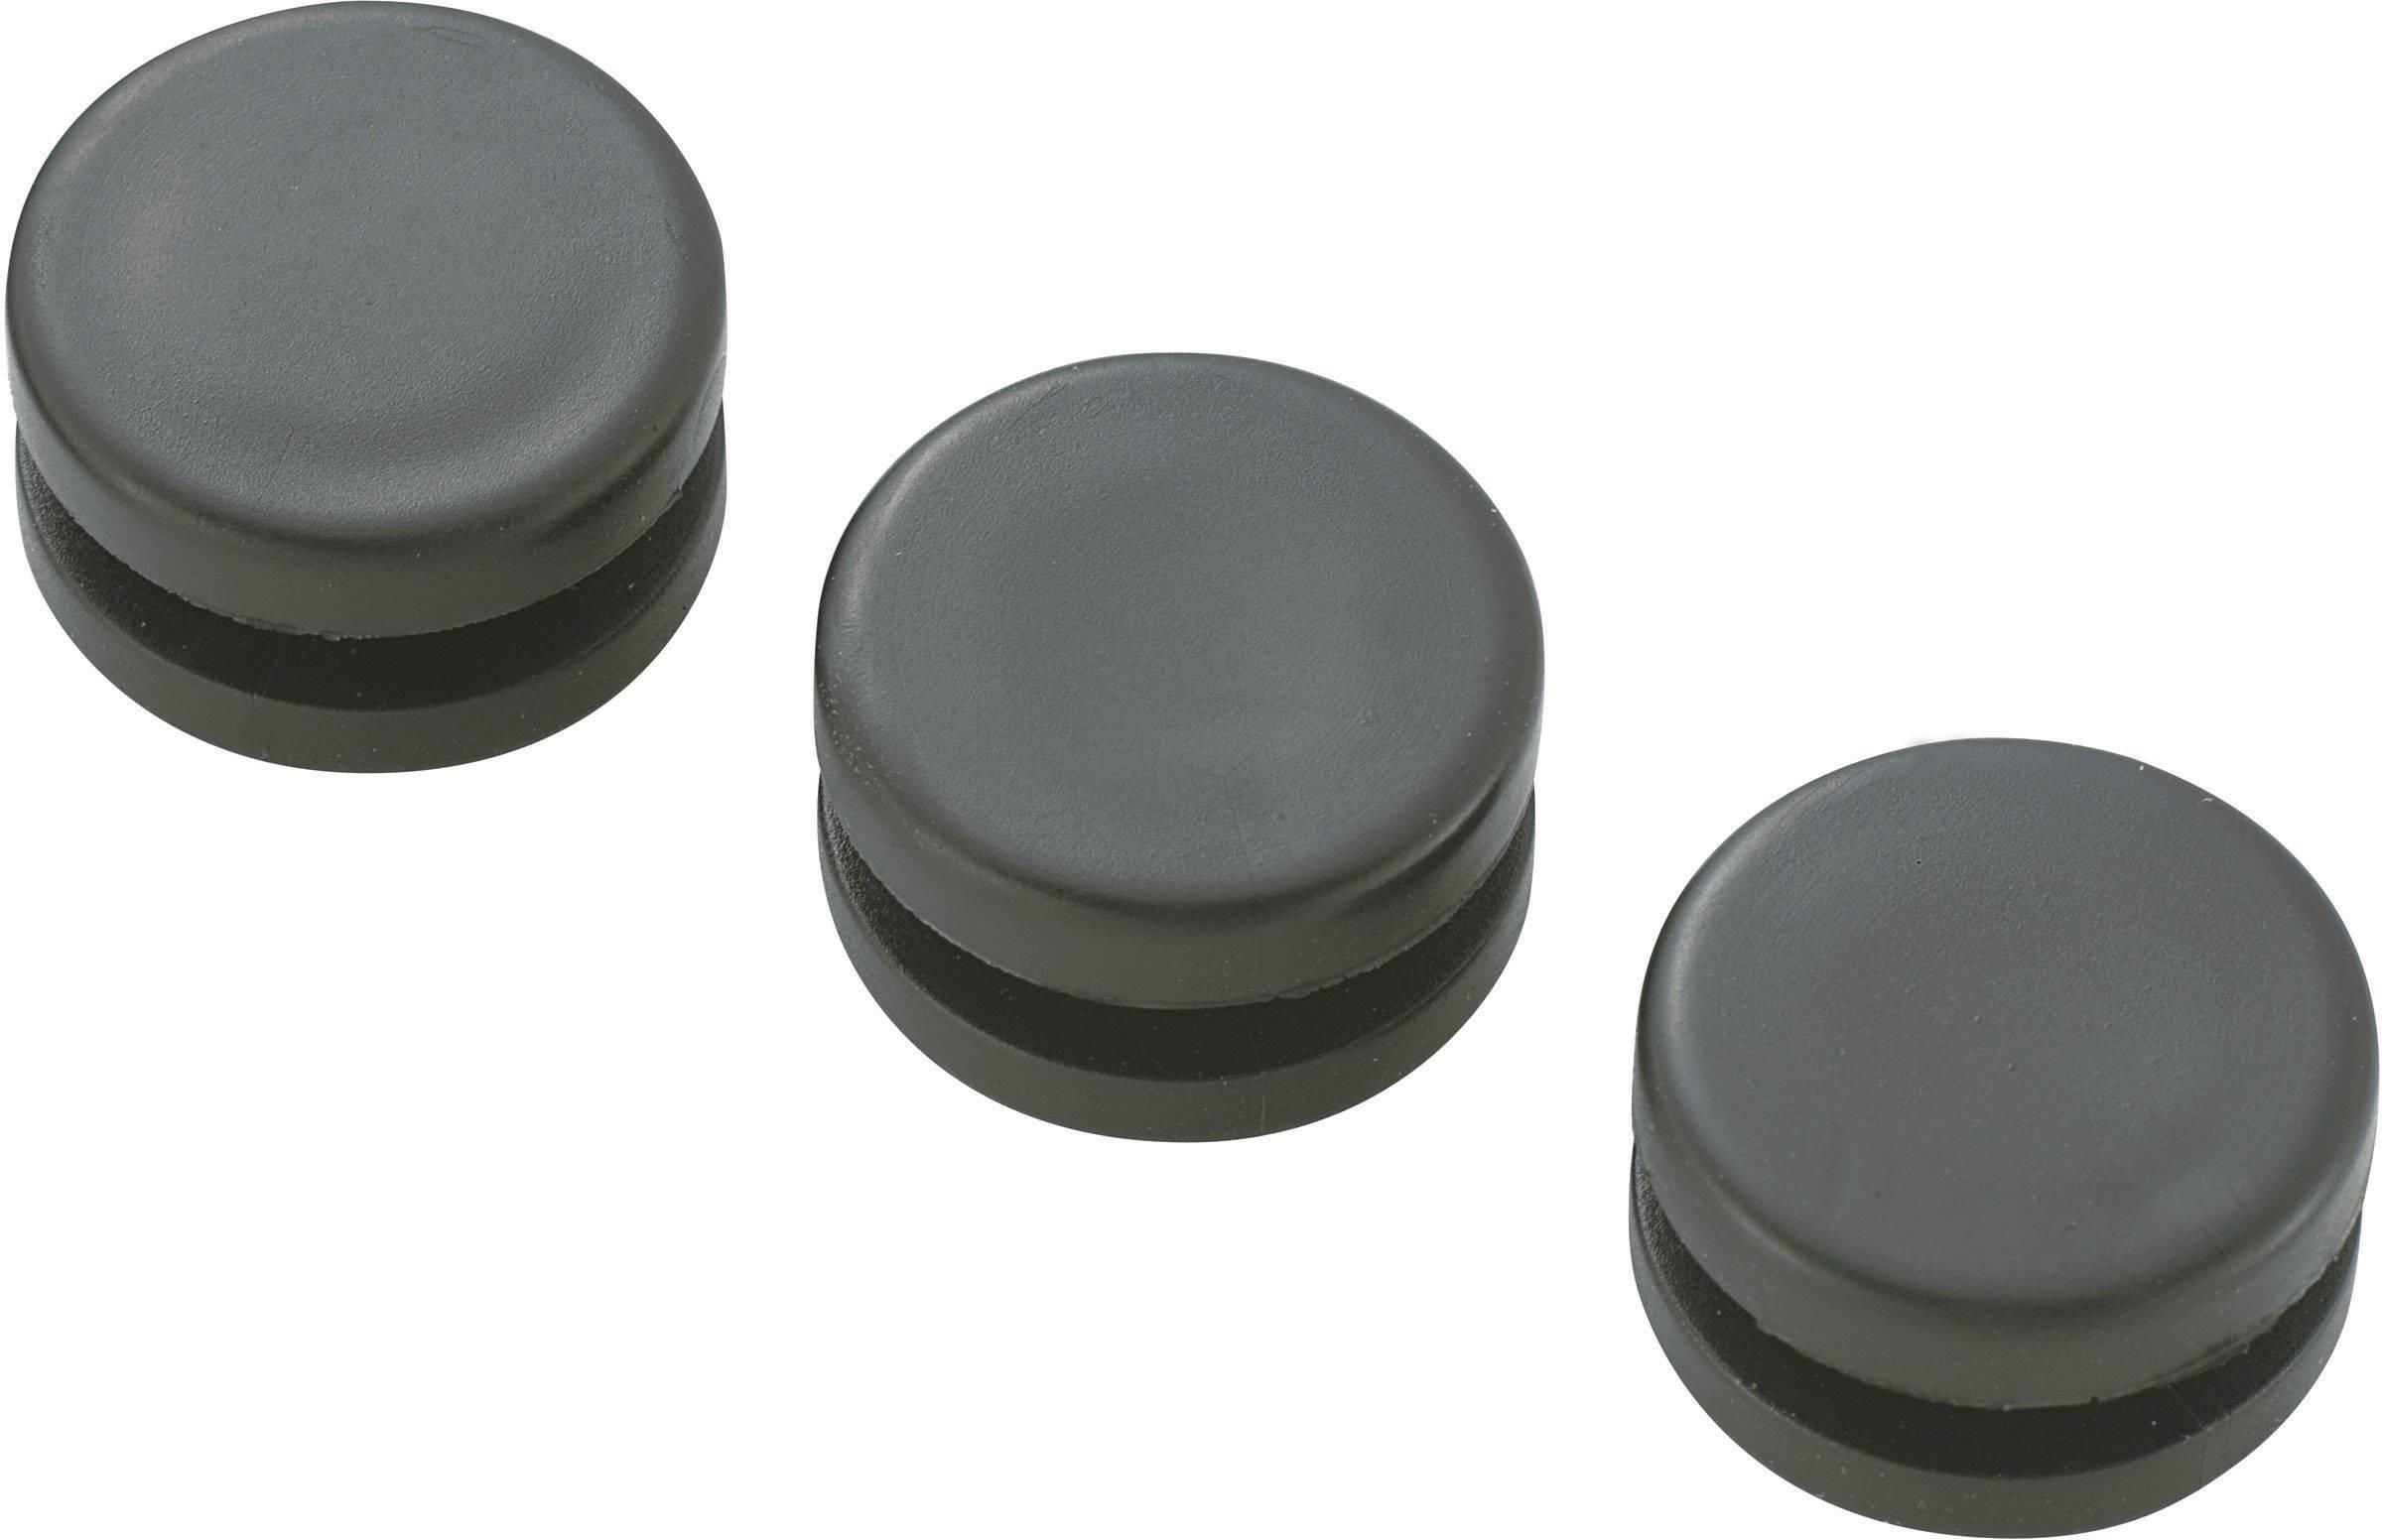 Káblová priechodka KSS GMCQR-1108, Ø 7.8 mm, PVC, čierna, 1 ks